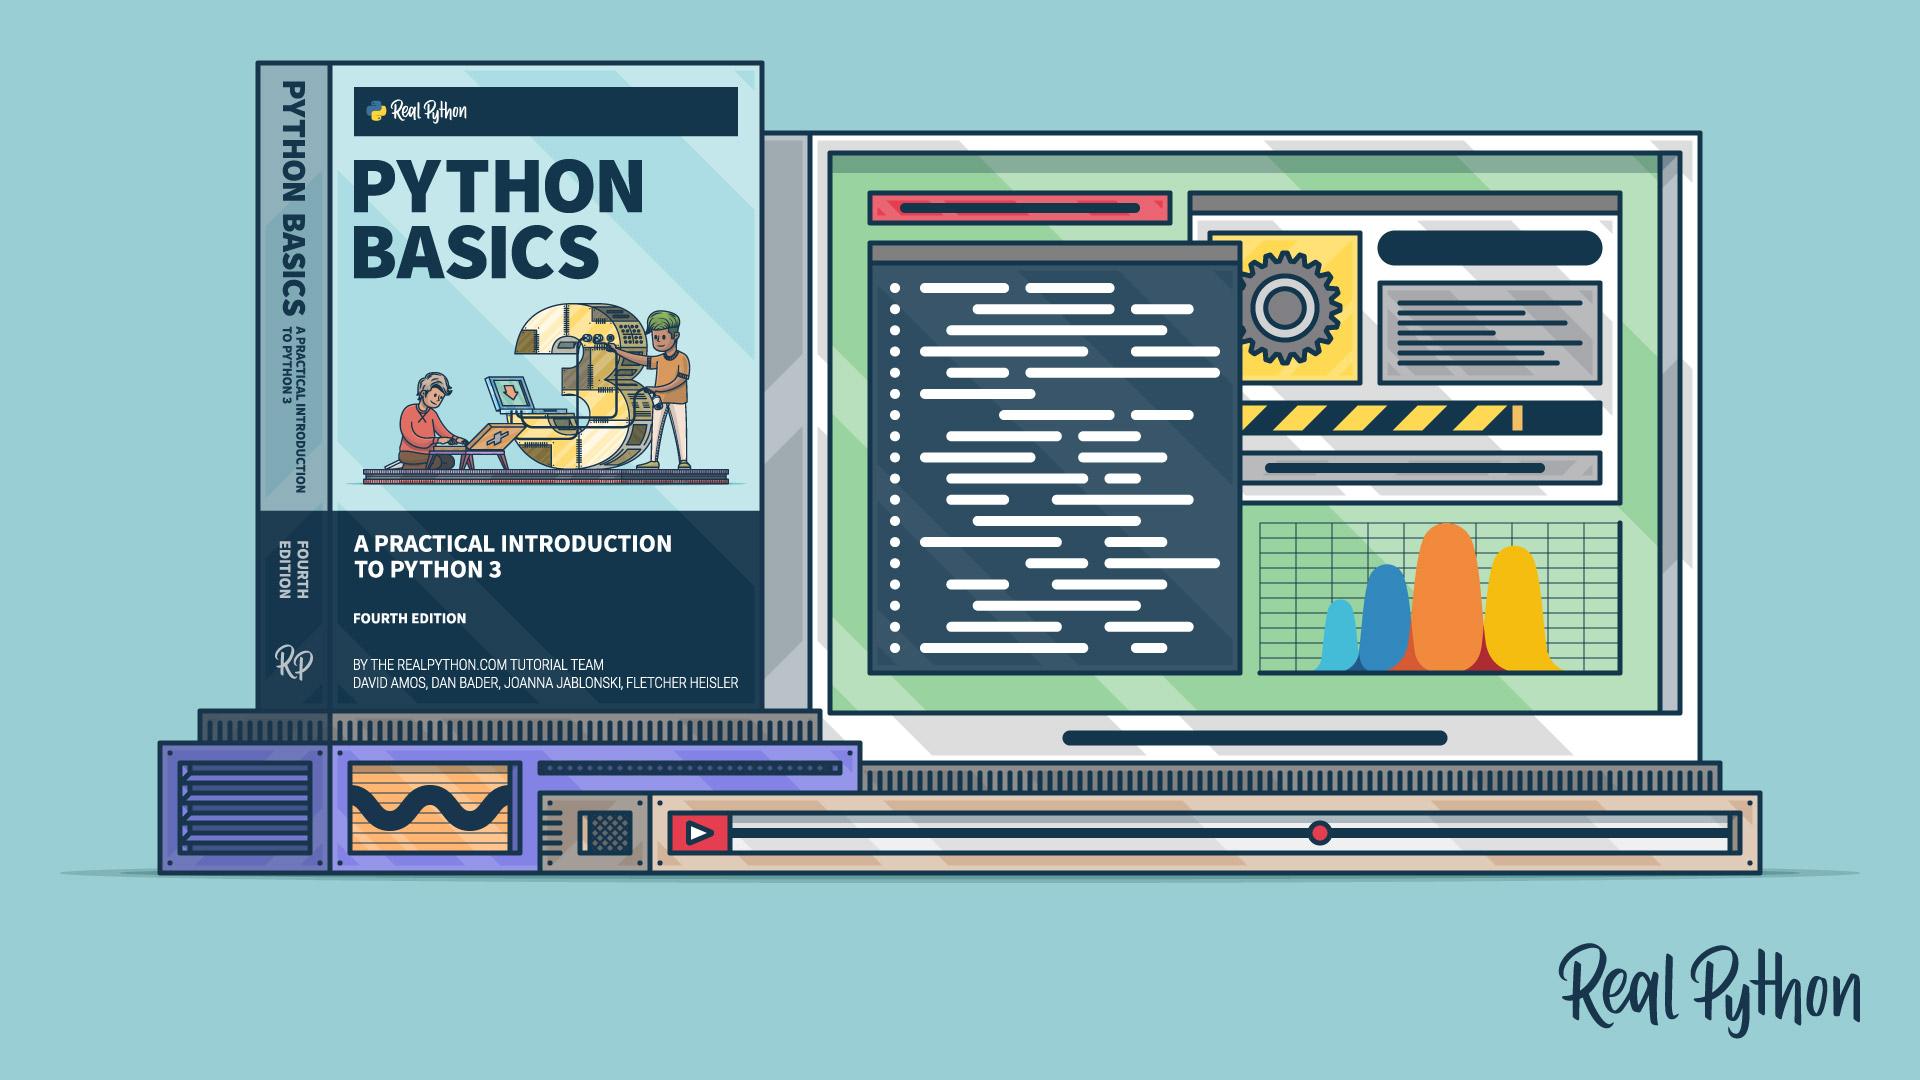 Python Basics Video Course Setup Artwork